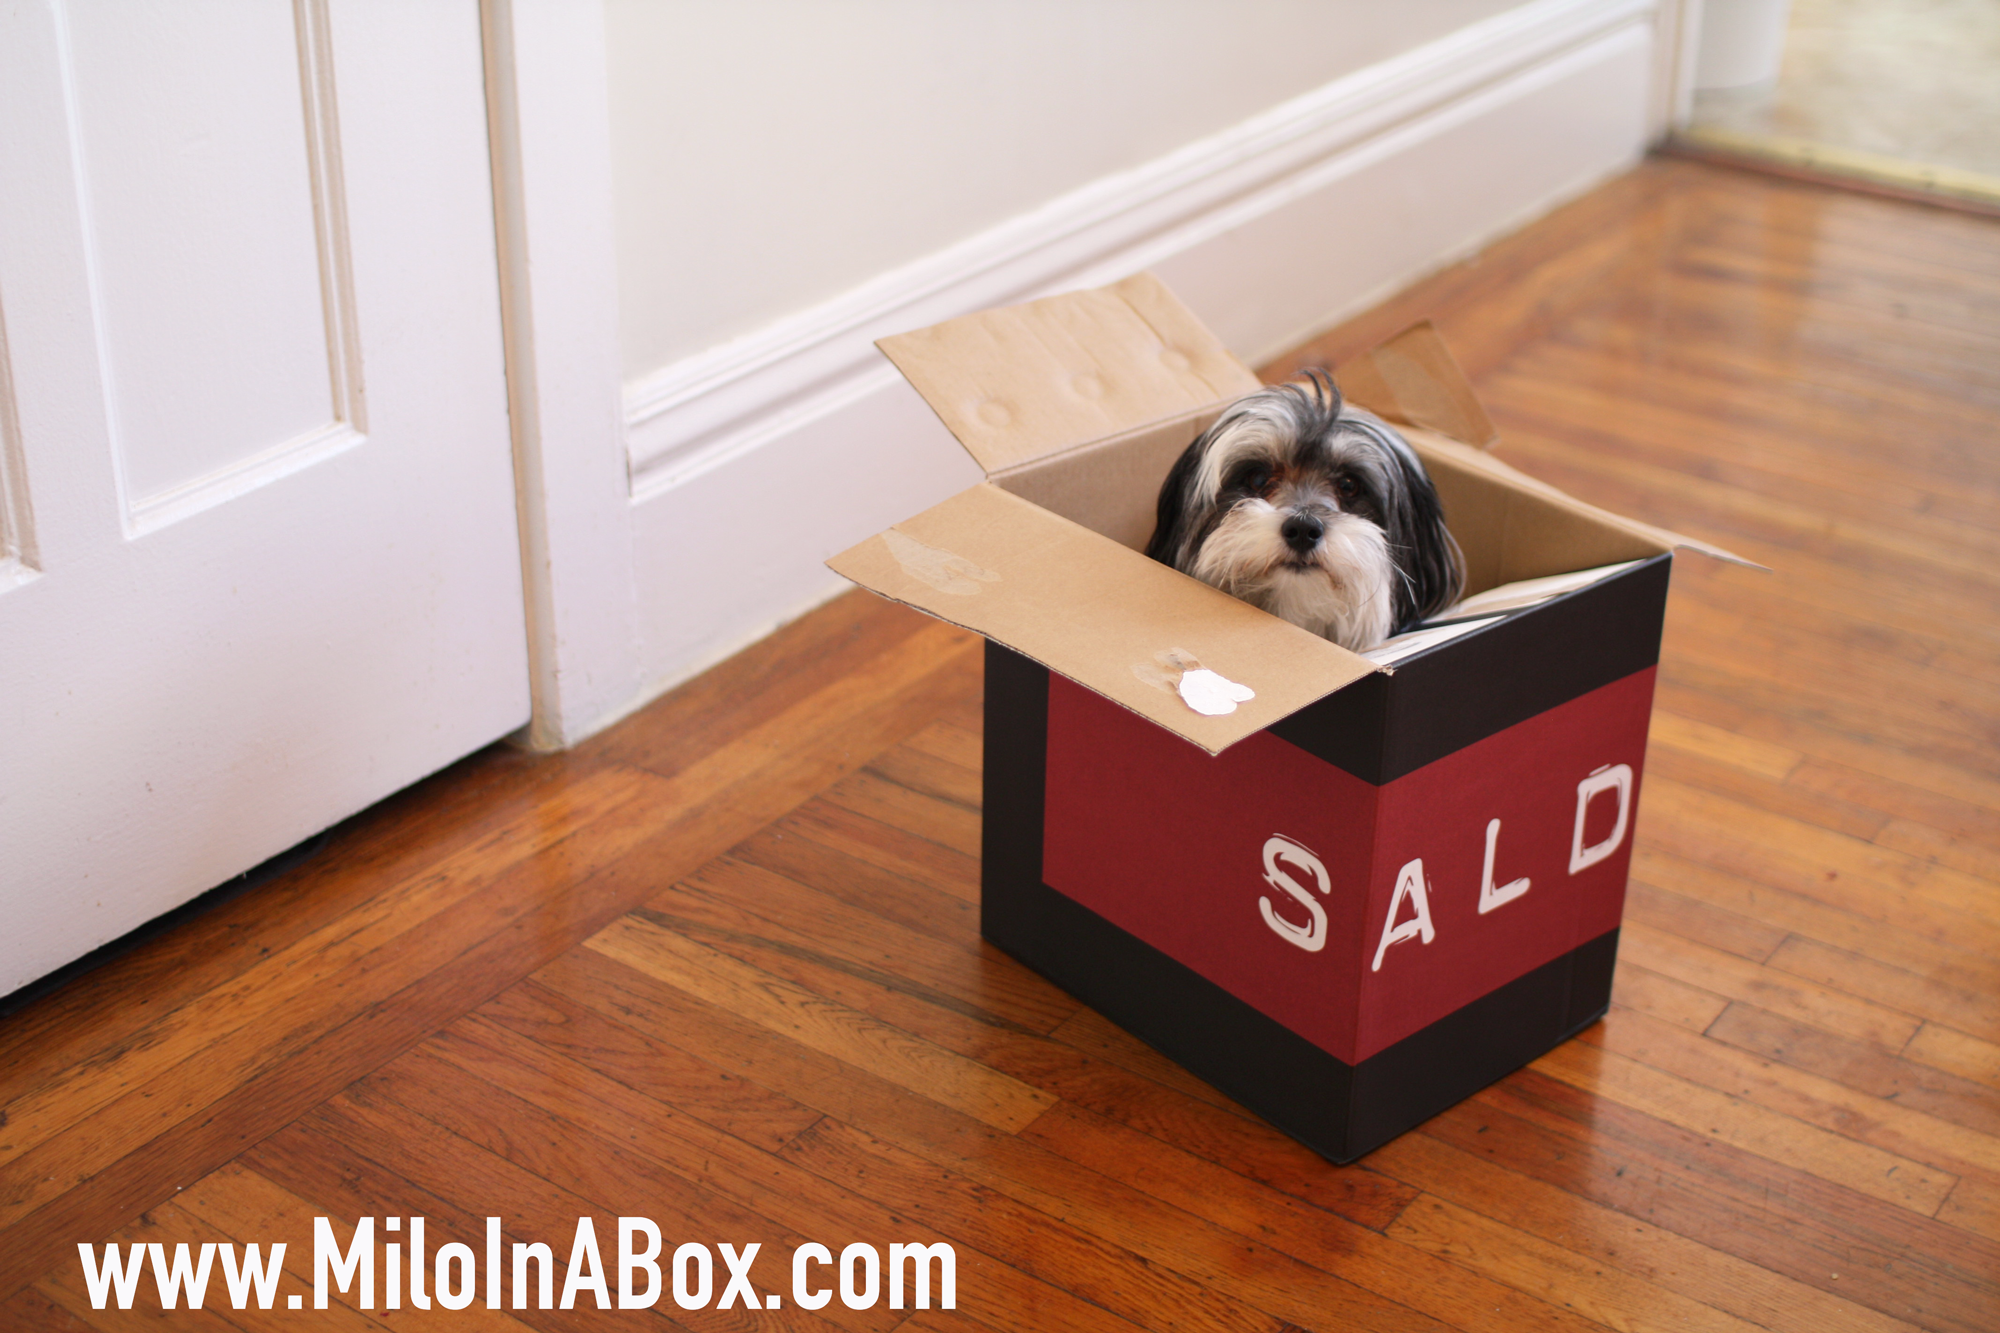 milo_in_a_box_saldo